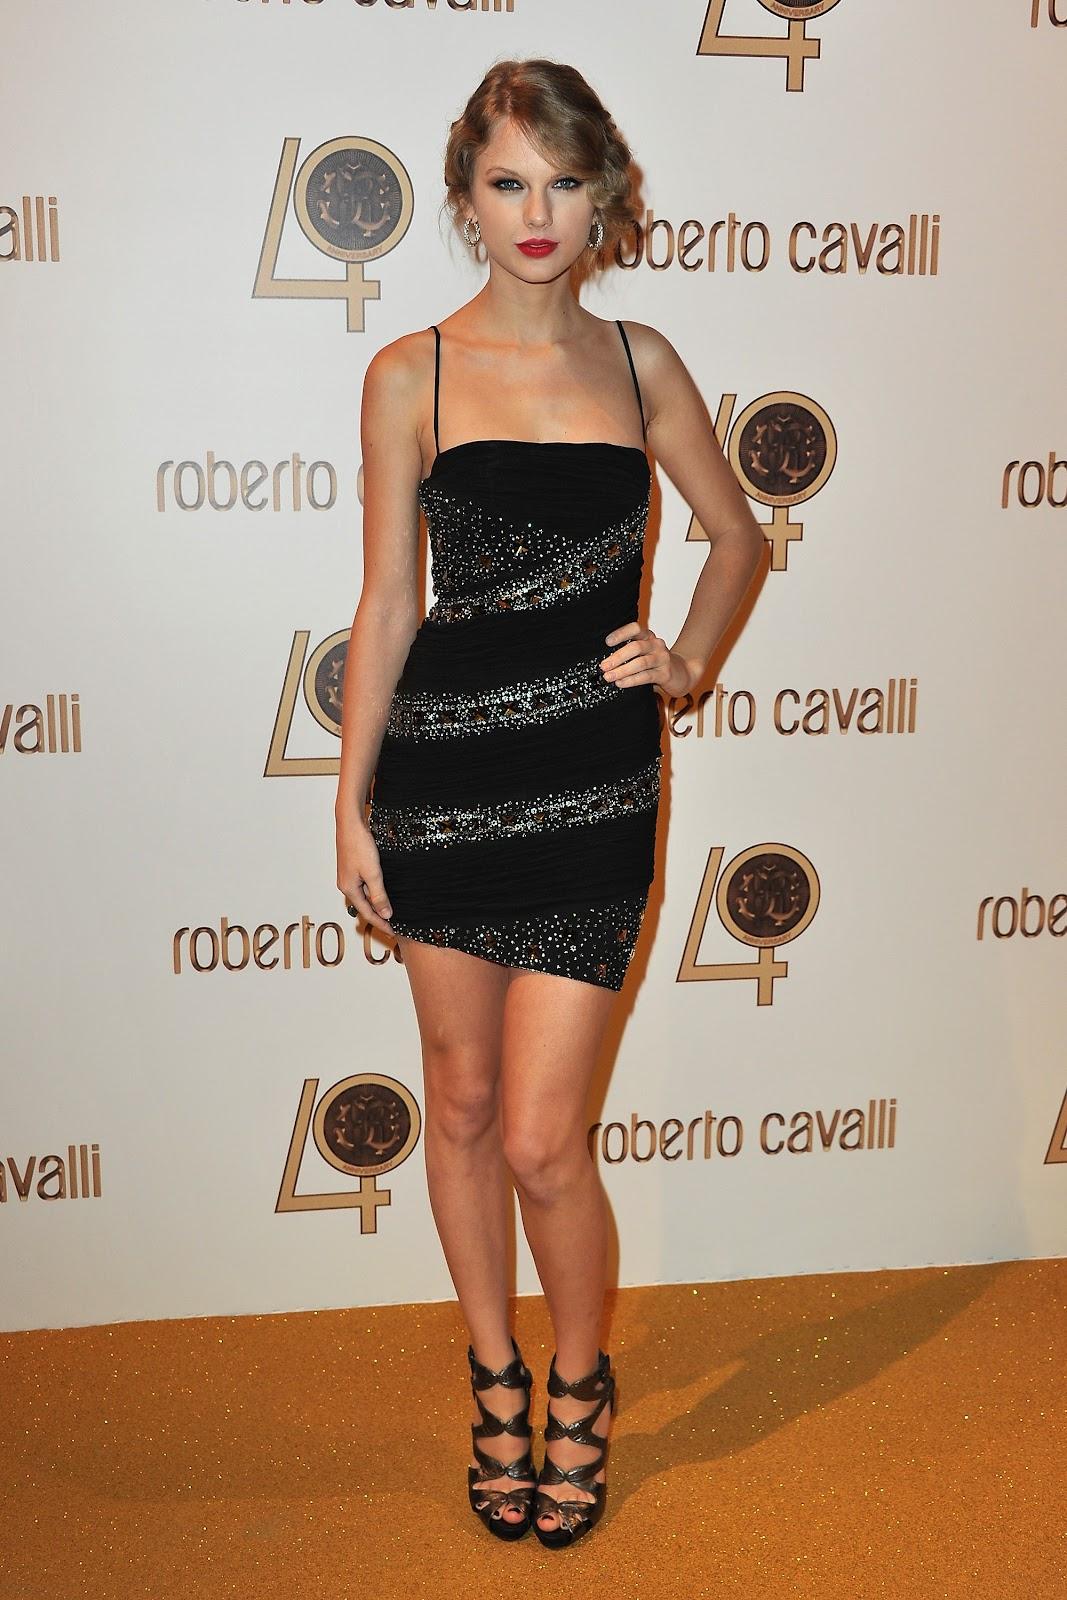 http://3.bp.blogspot.com/-boU1758-ekQ/UOSGzpOl-5I/AAAAAAAAAXA/v_92M7wOEV0/s1600/Taylor+Swift+feet5.jpg